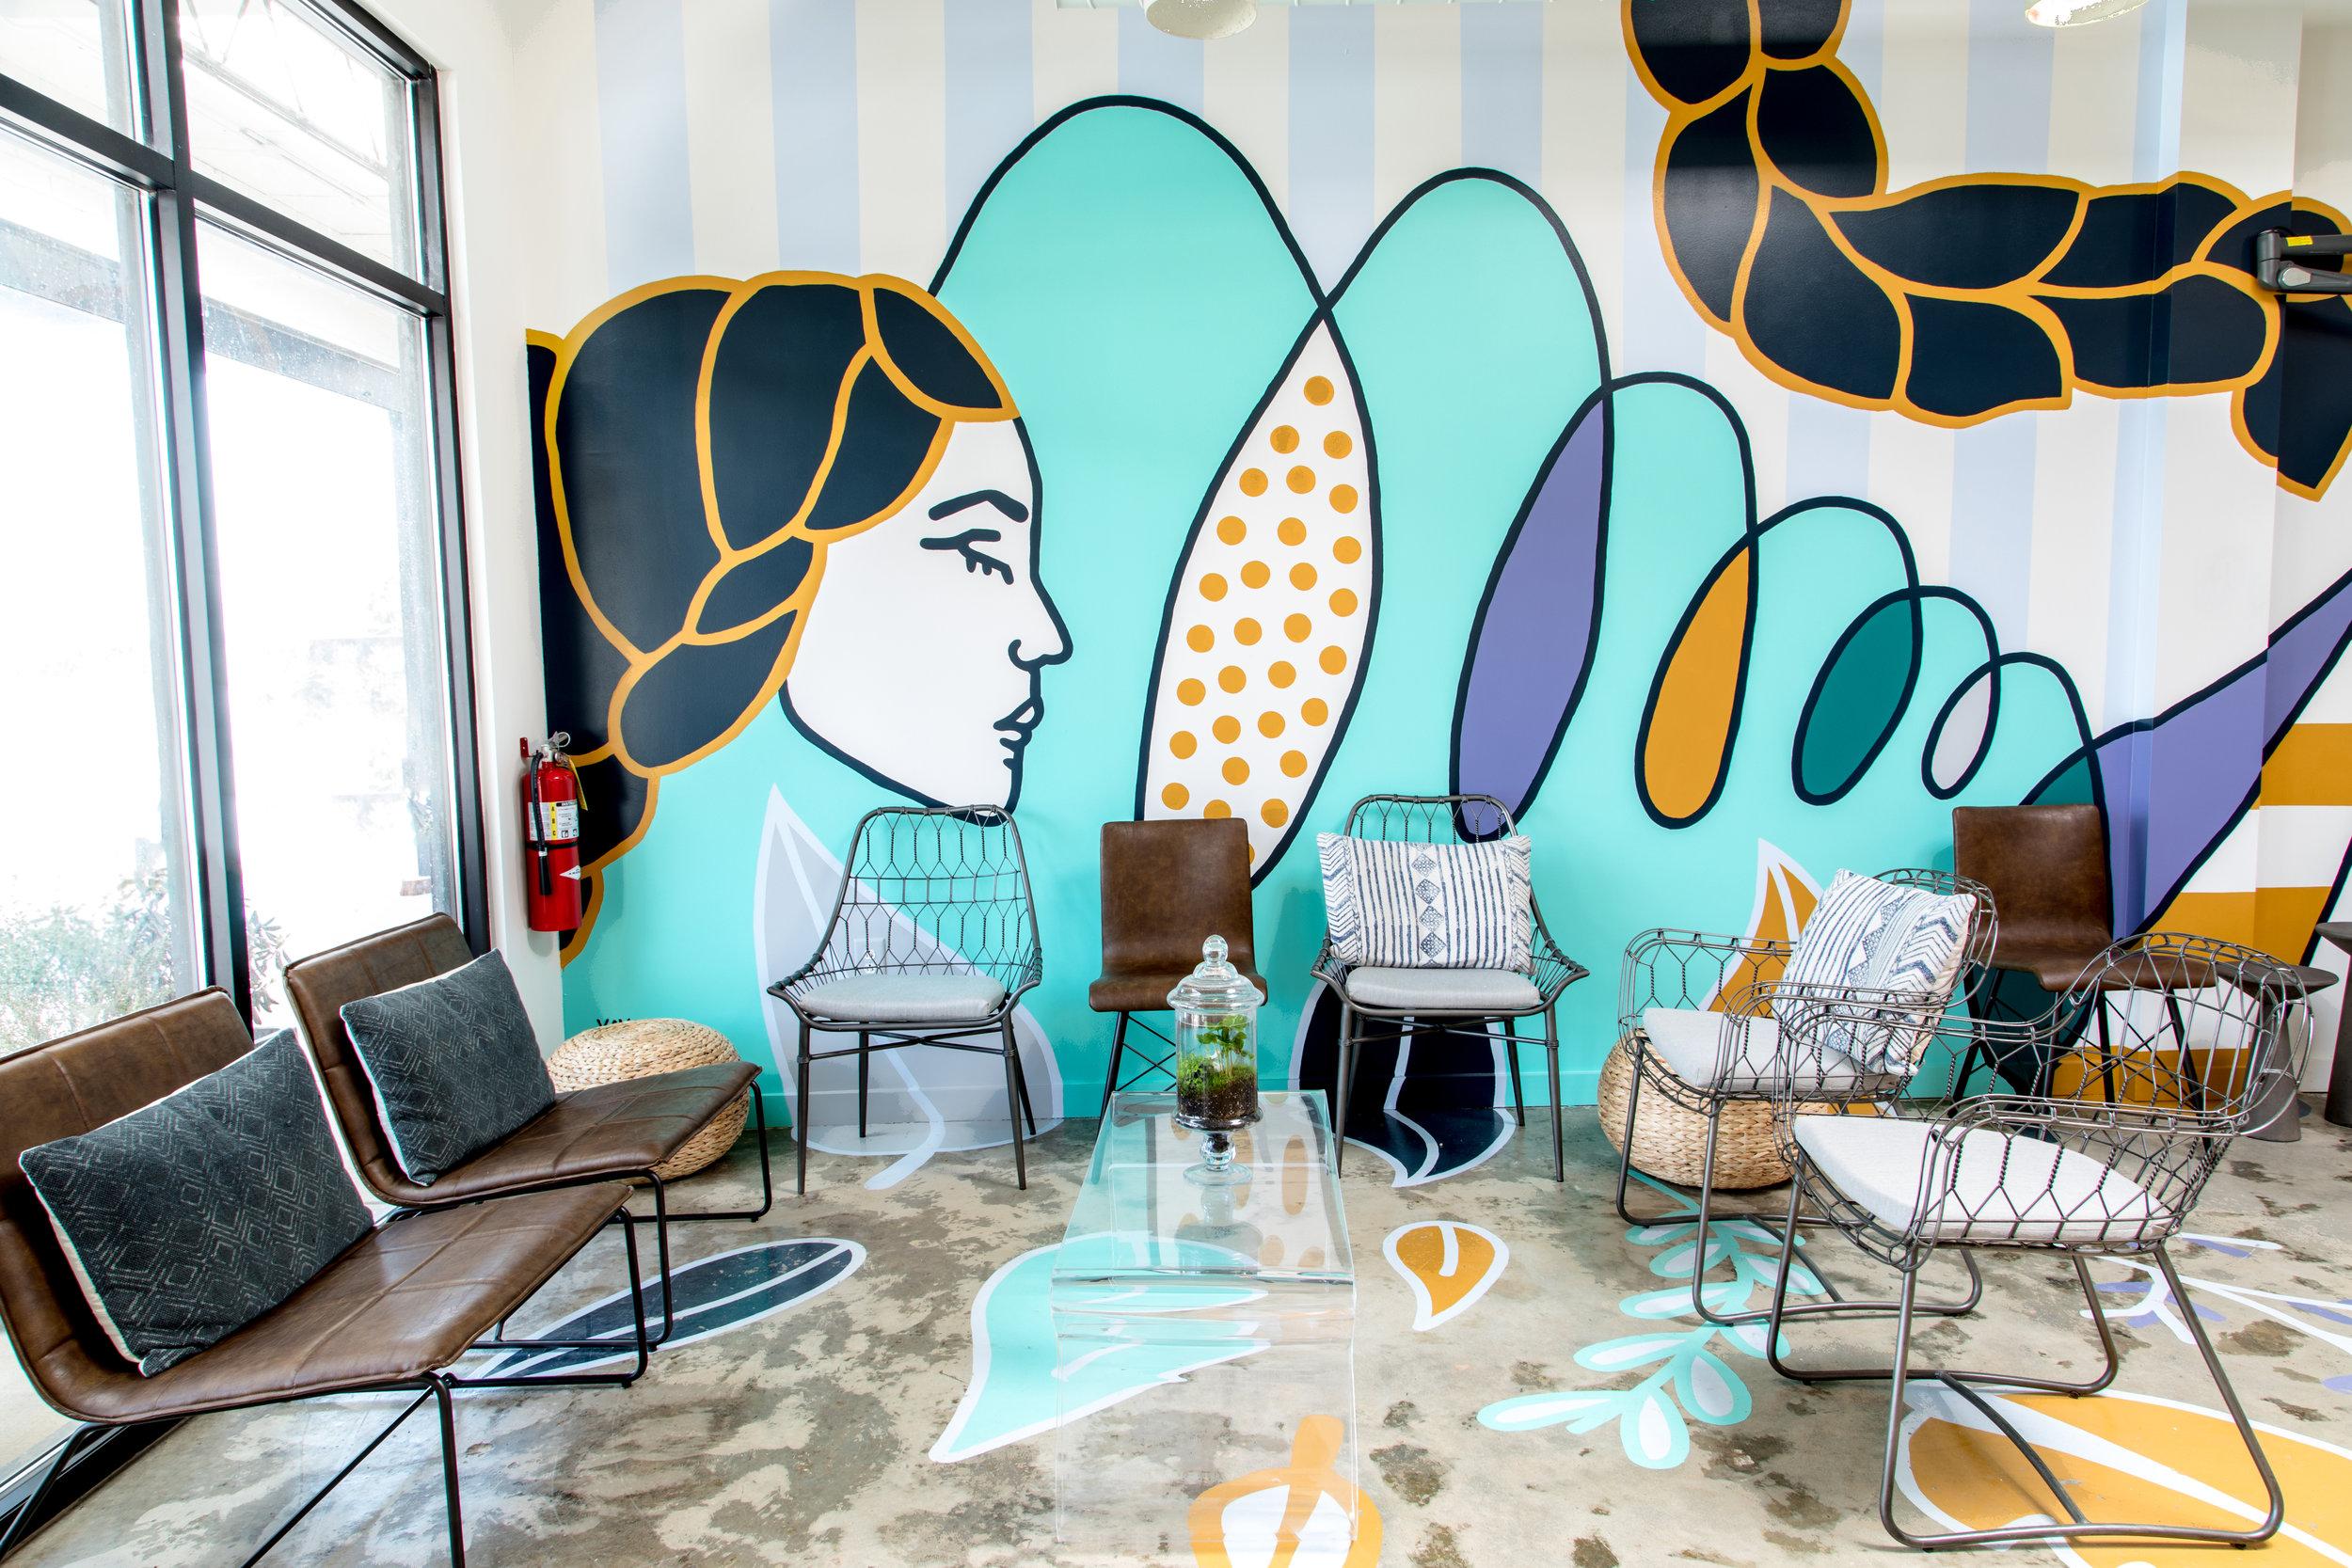 900 DeKalb Ave NE suite 400, Atlanta, GA 30307, USA ( Creature Studio  | Photos by  Raymond McCrea Jones )